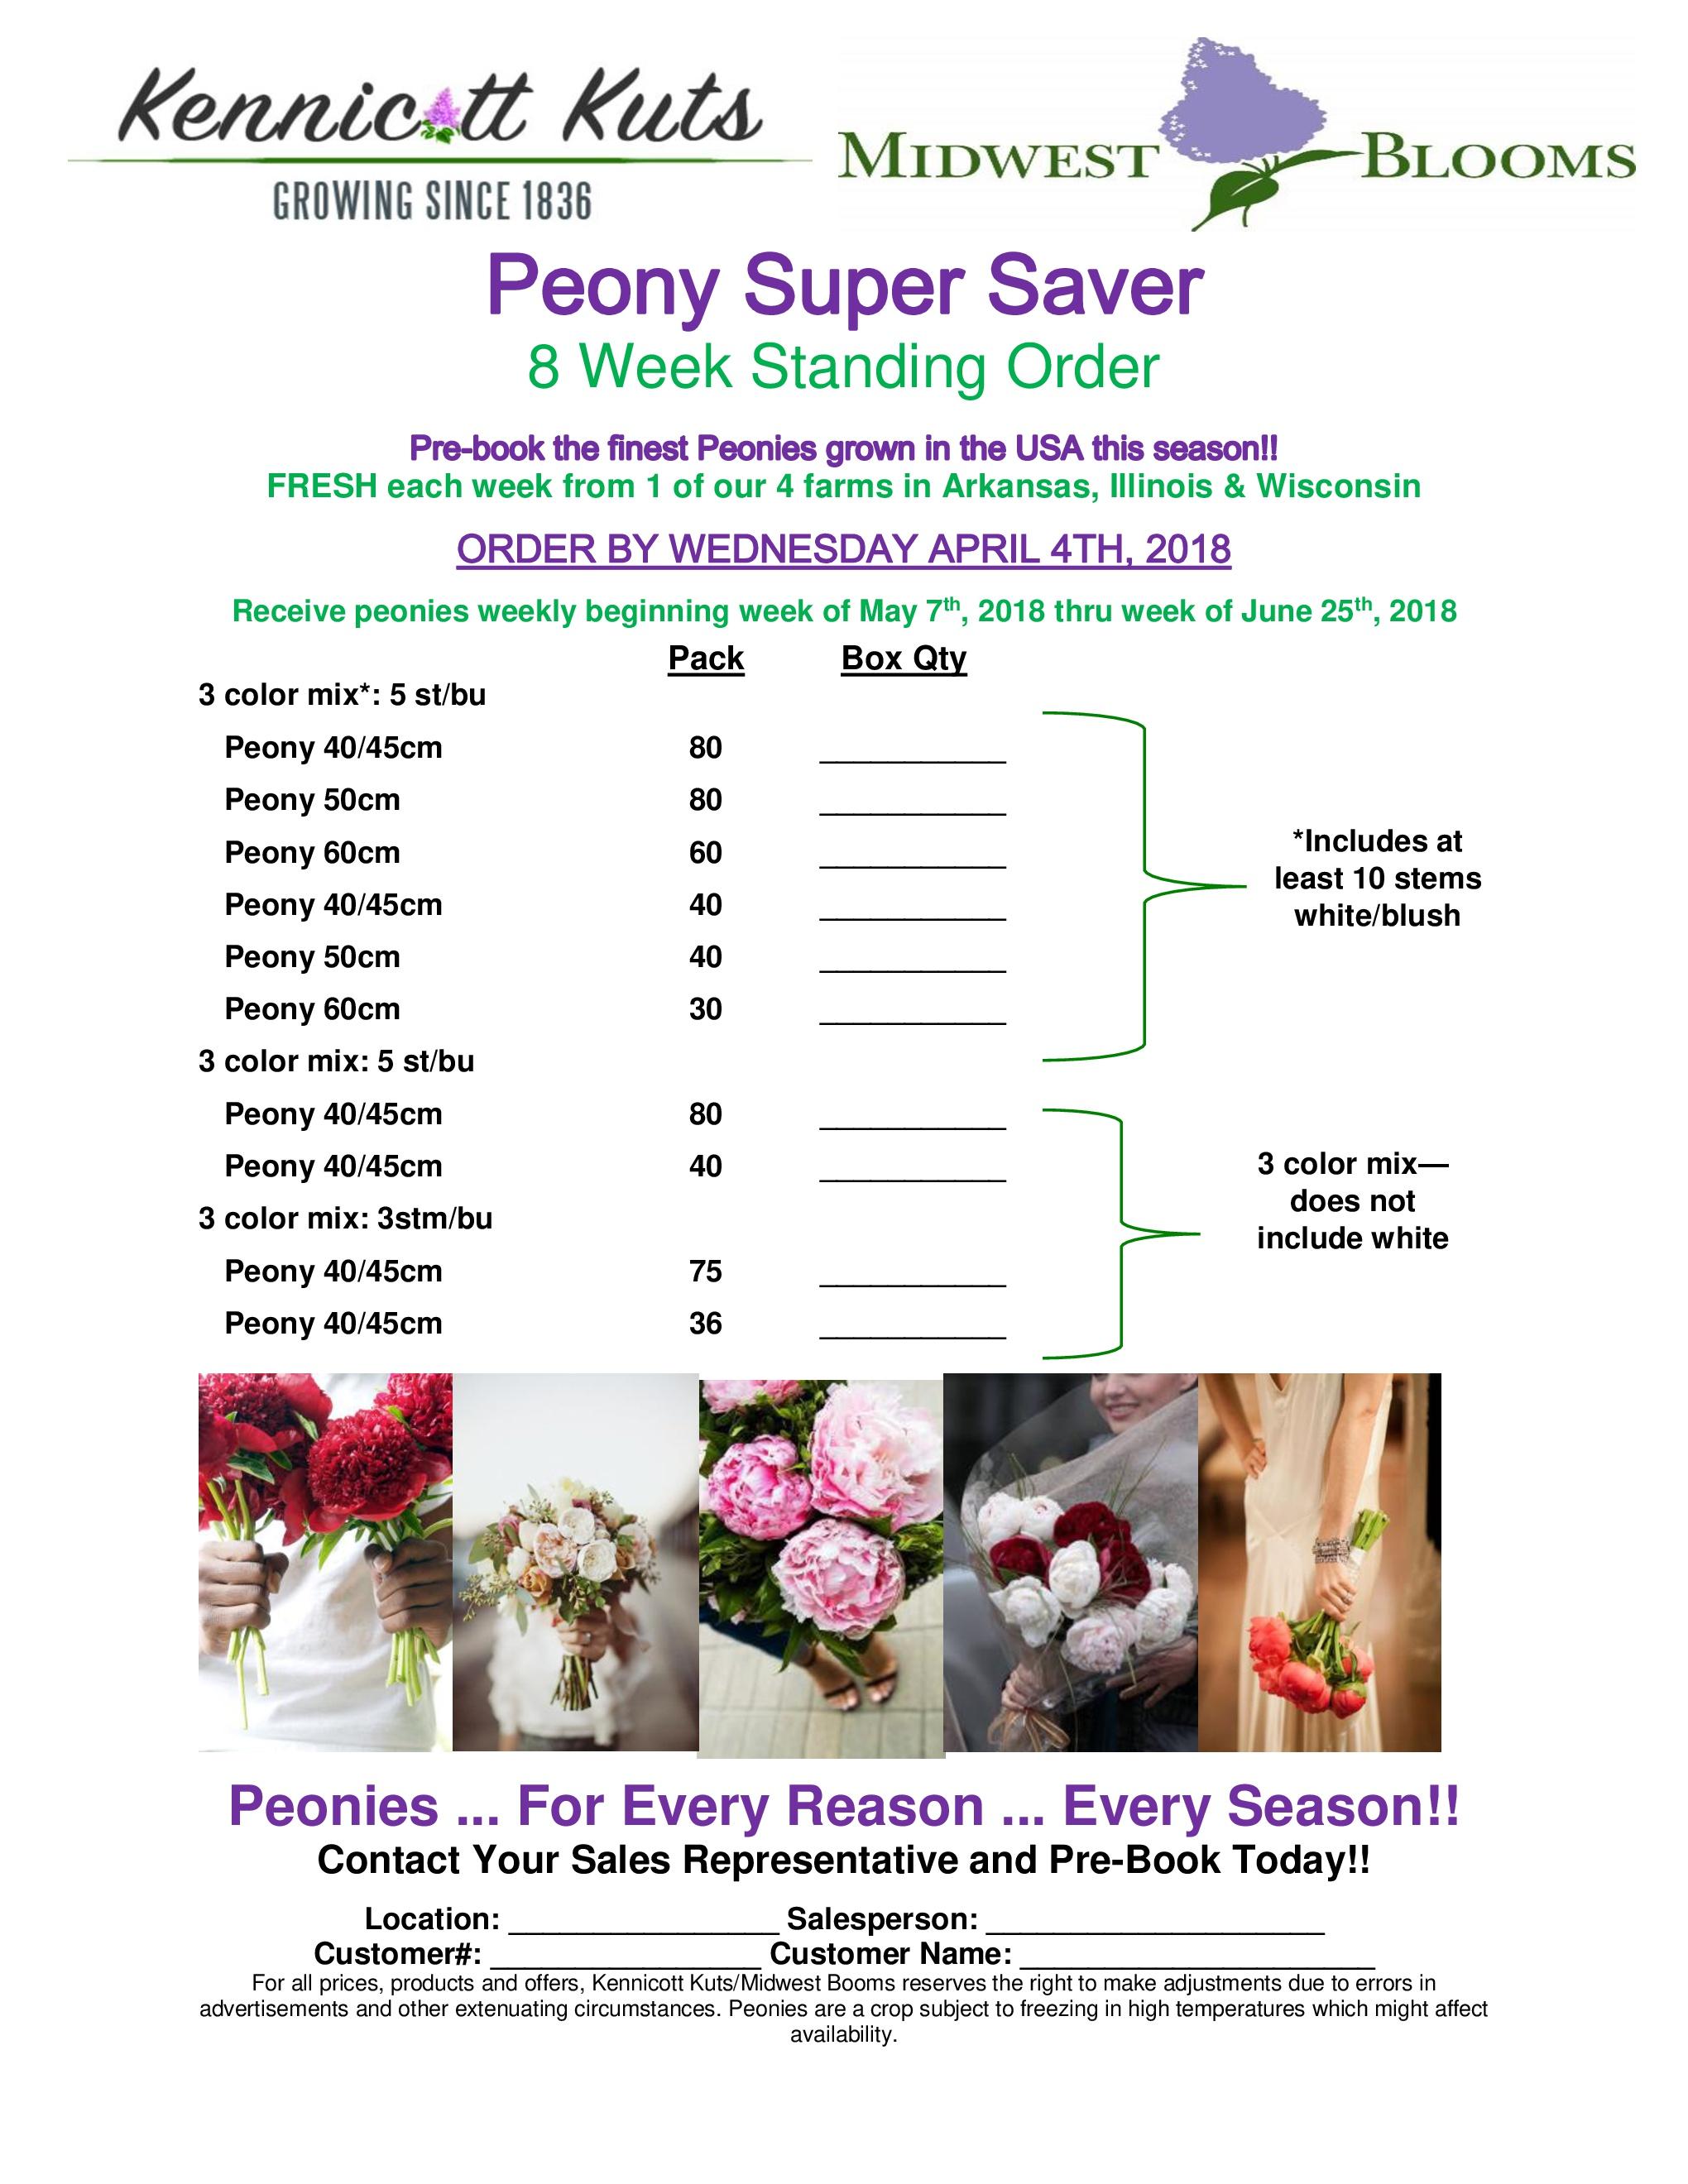 8 week peony super saver